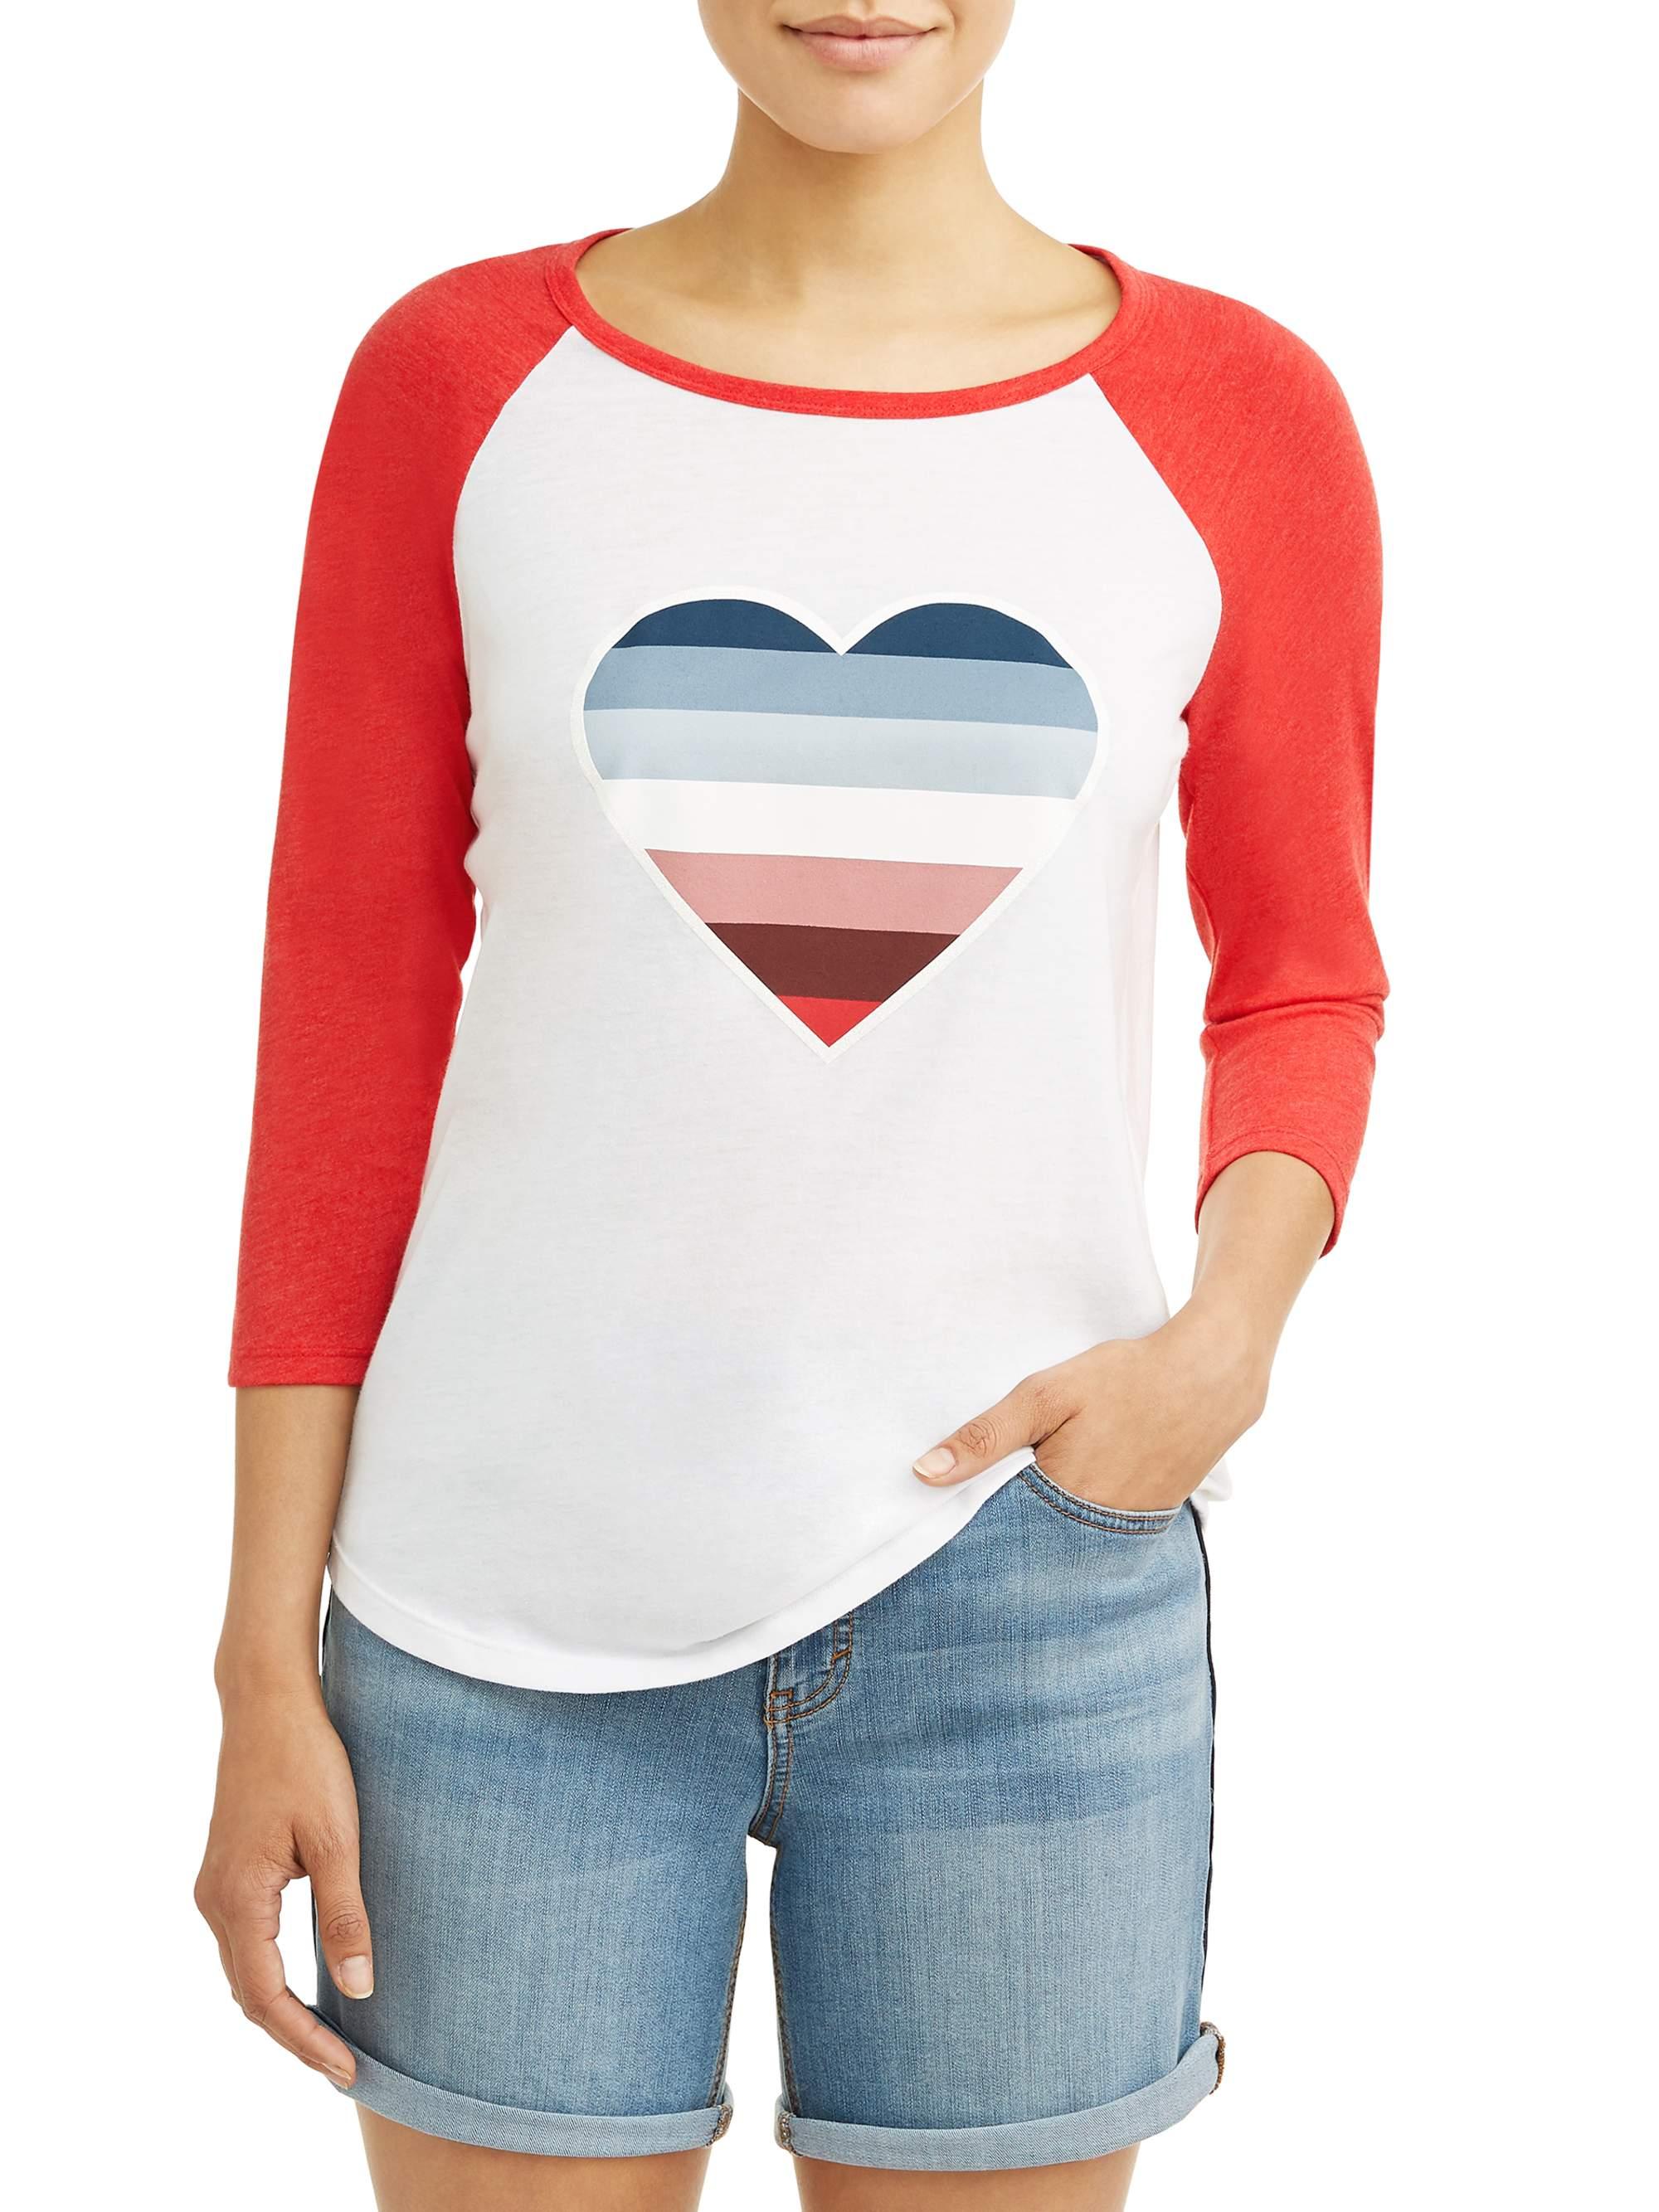 Ombre Heart 3/4 Sleeve Baseball Graphic Tee Women's